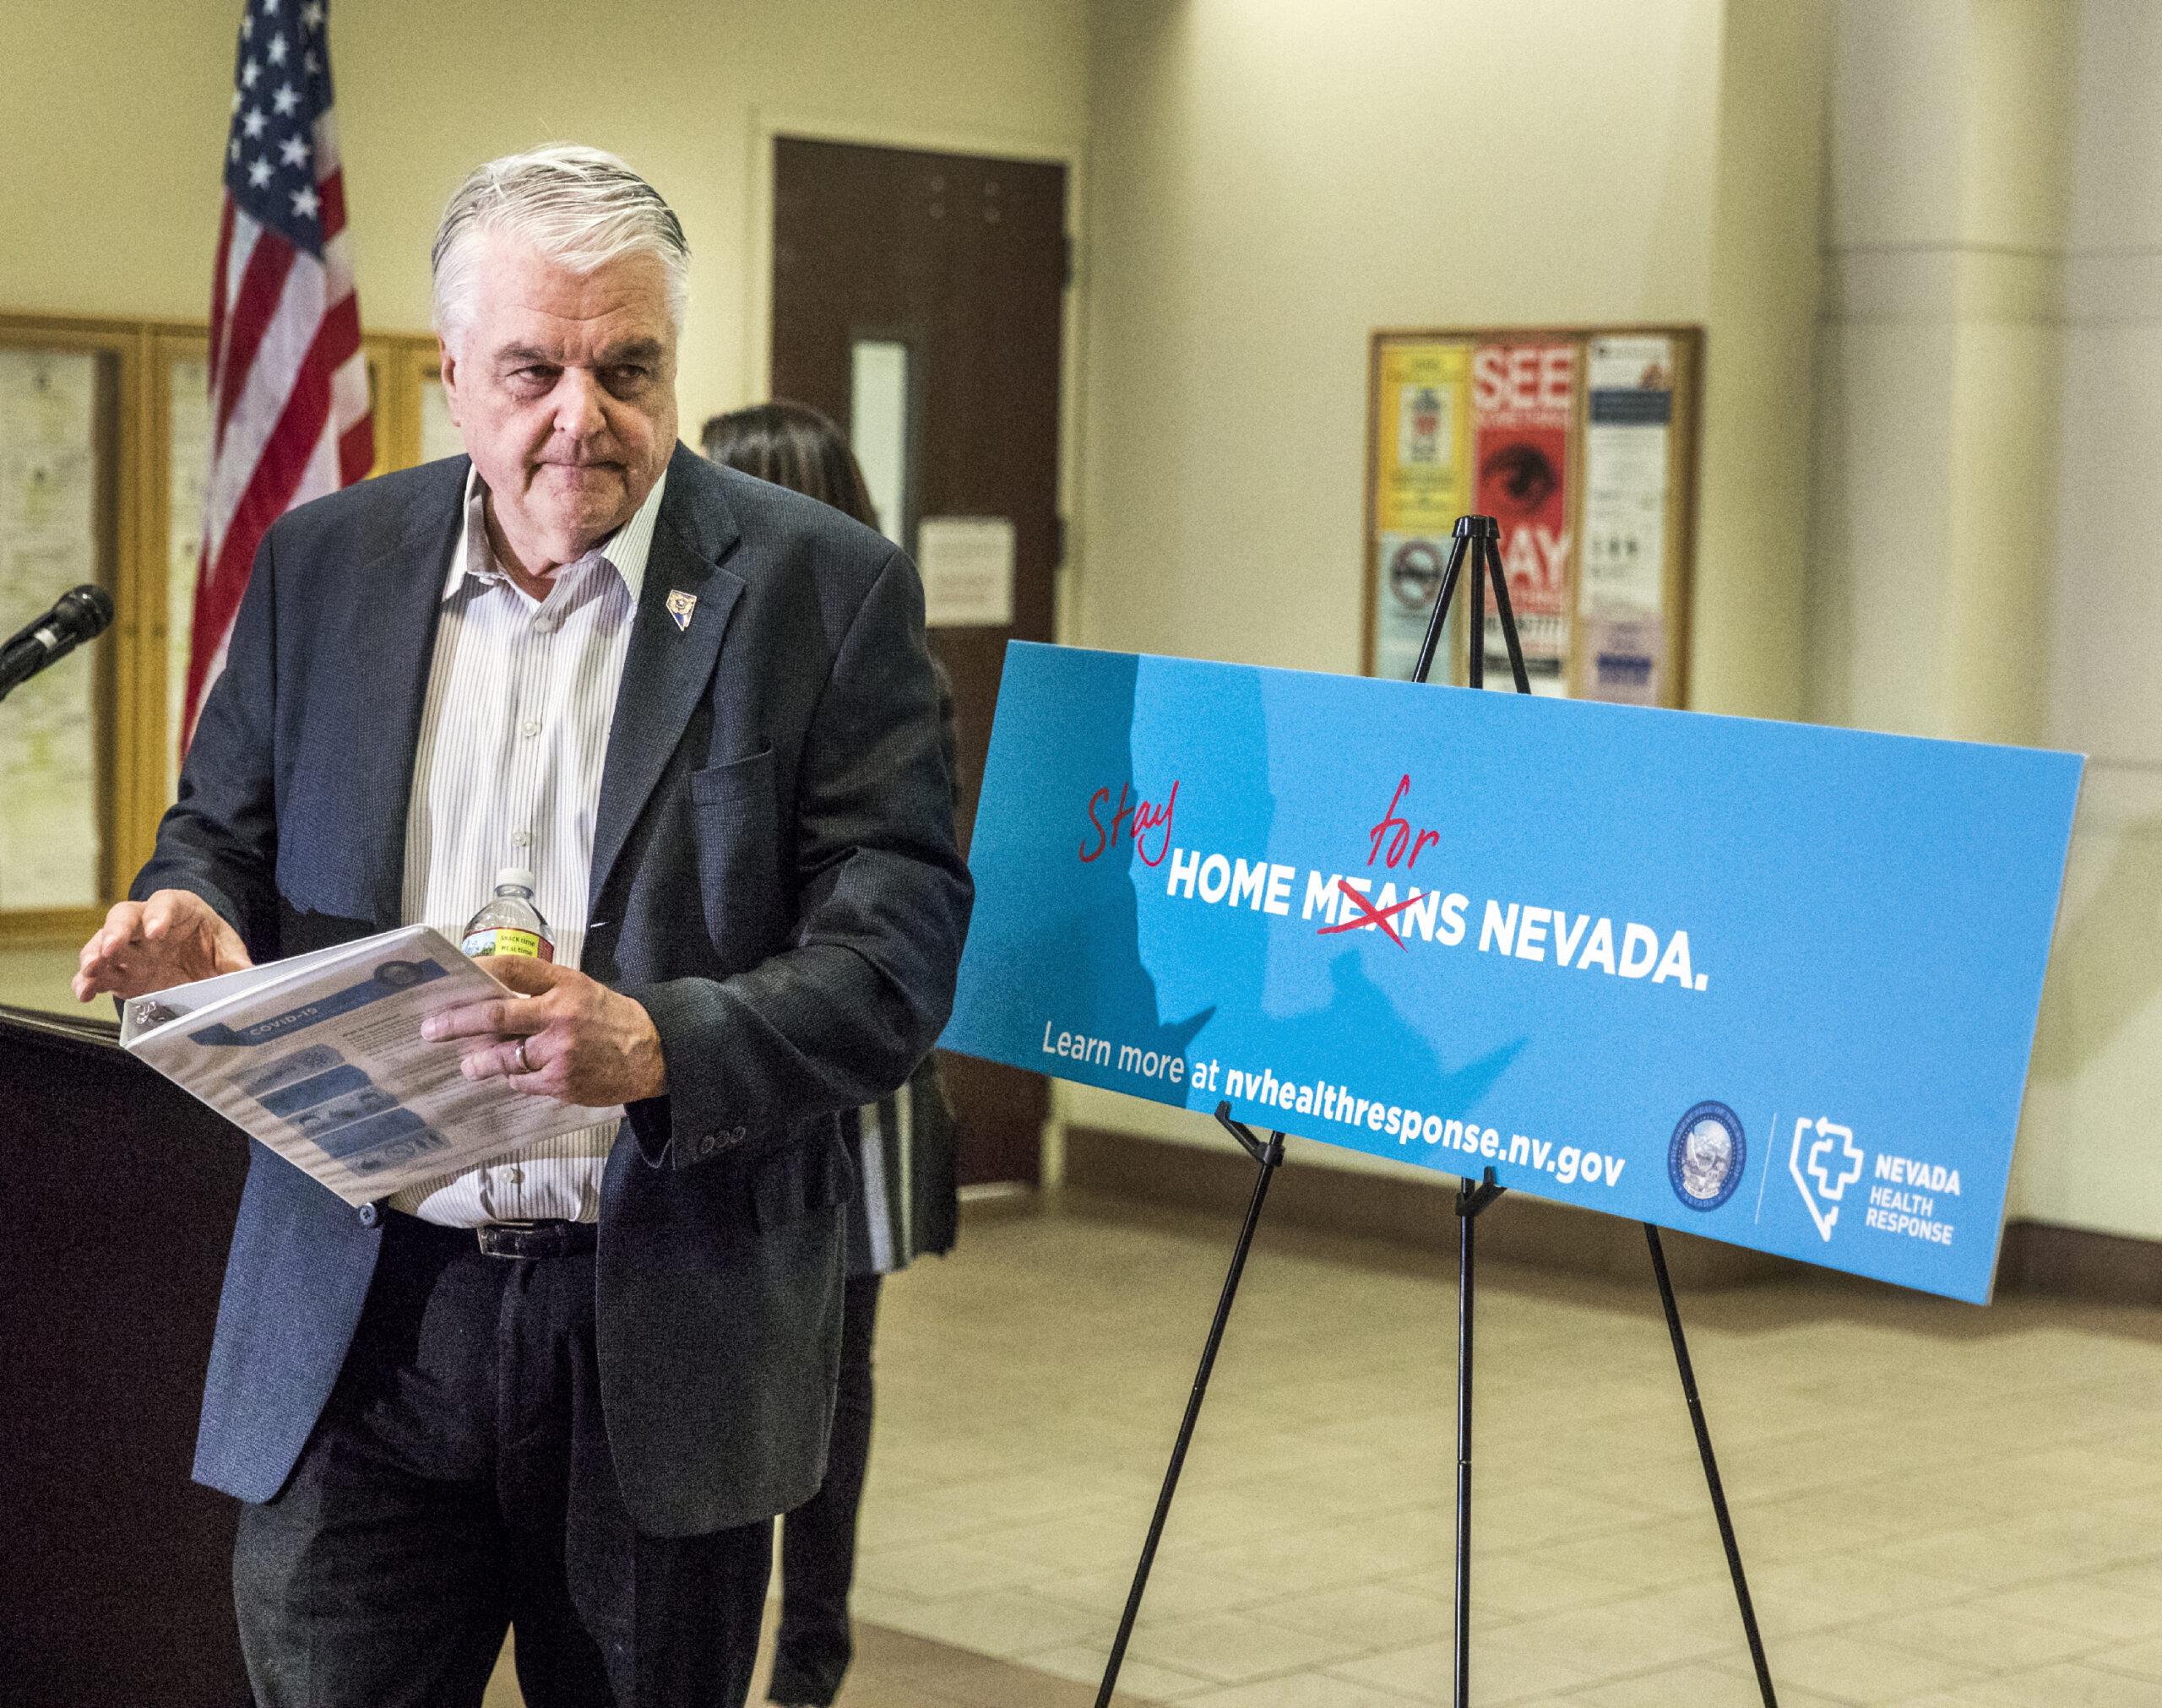 Steve Sisolak stands away from podium